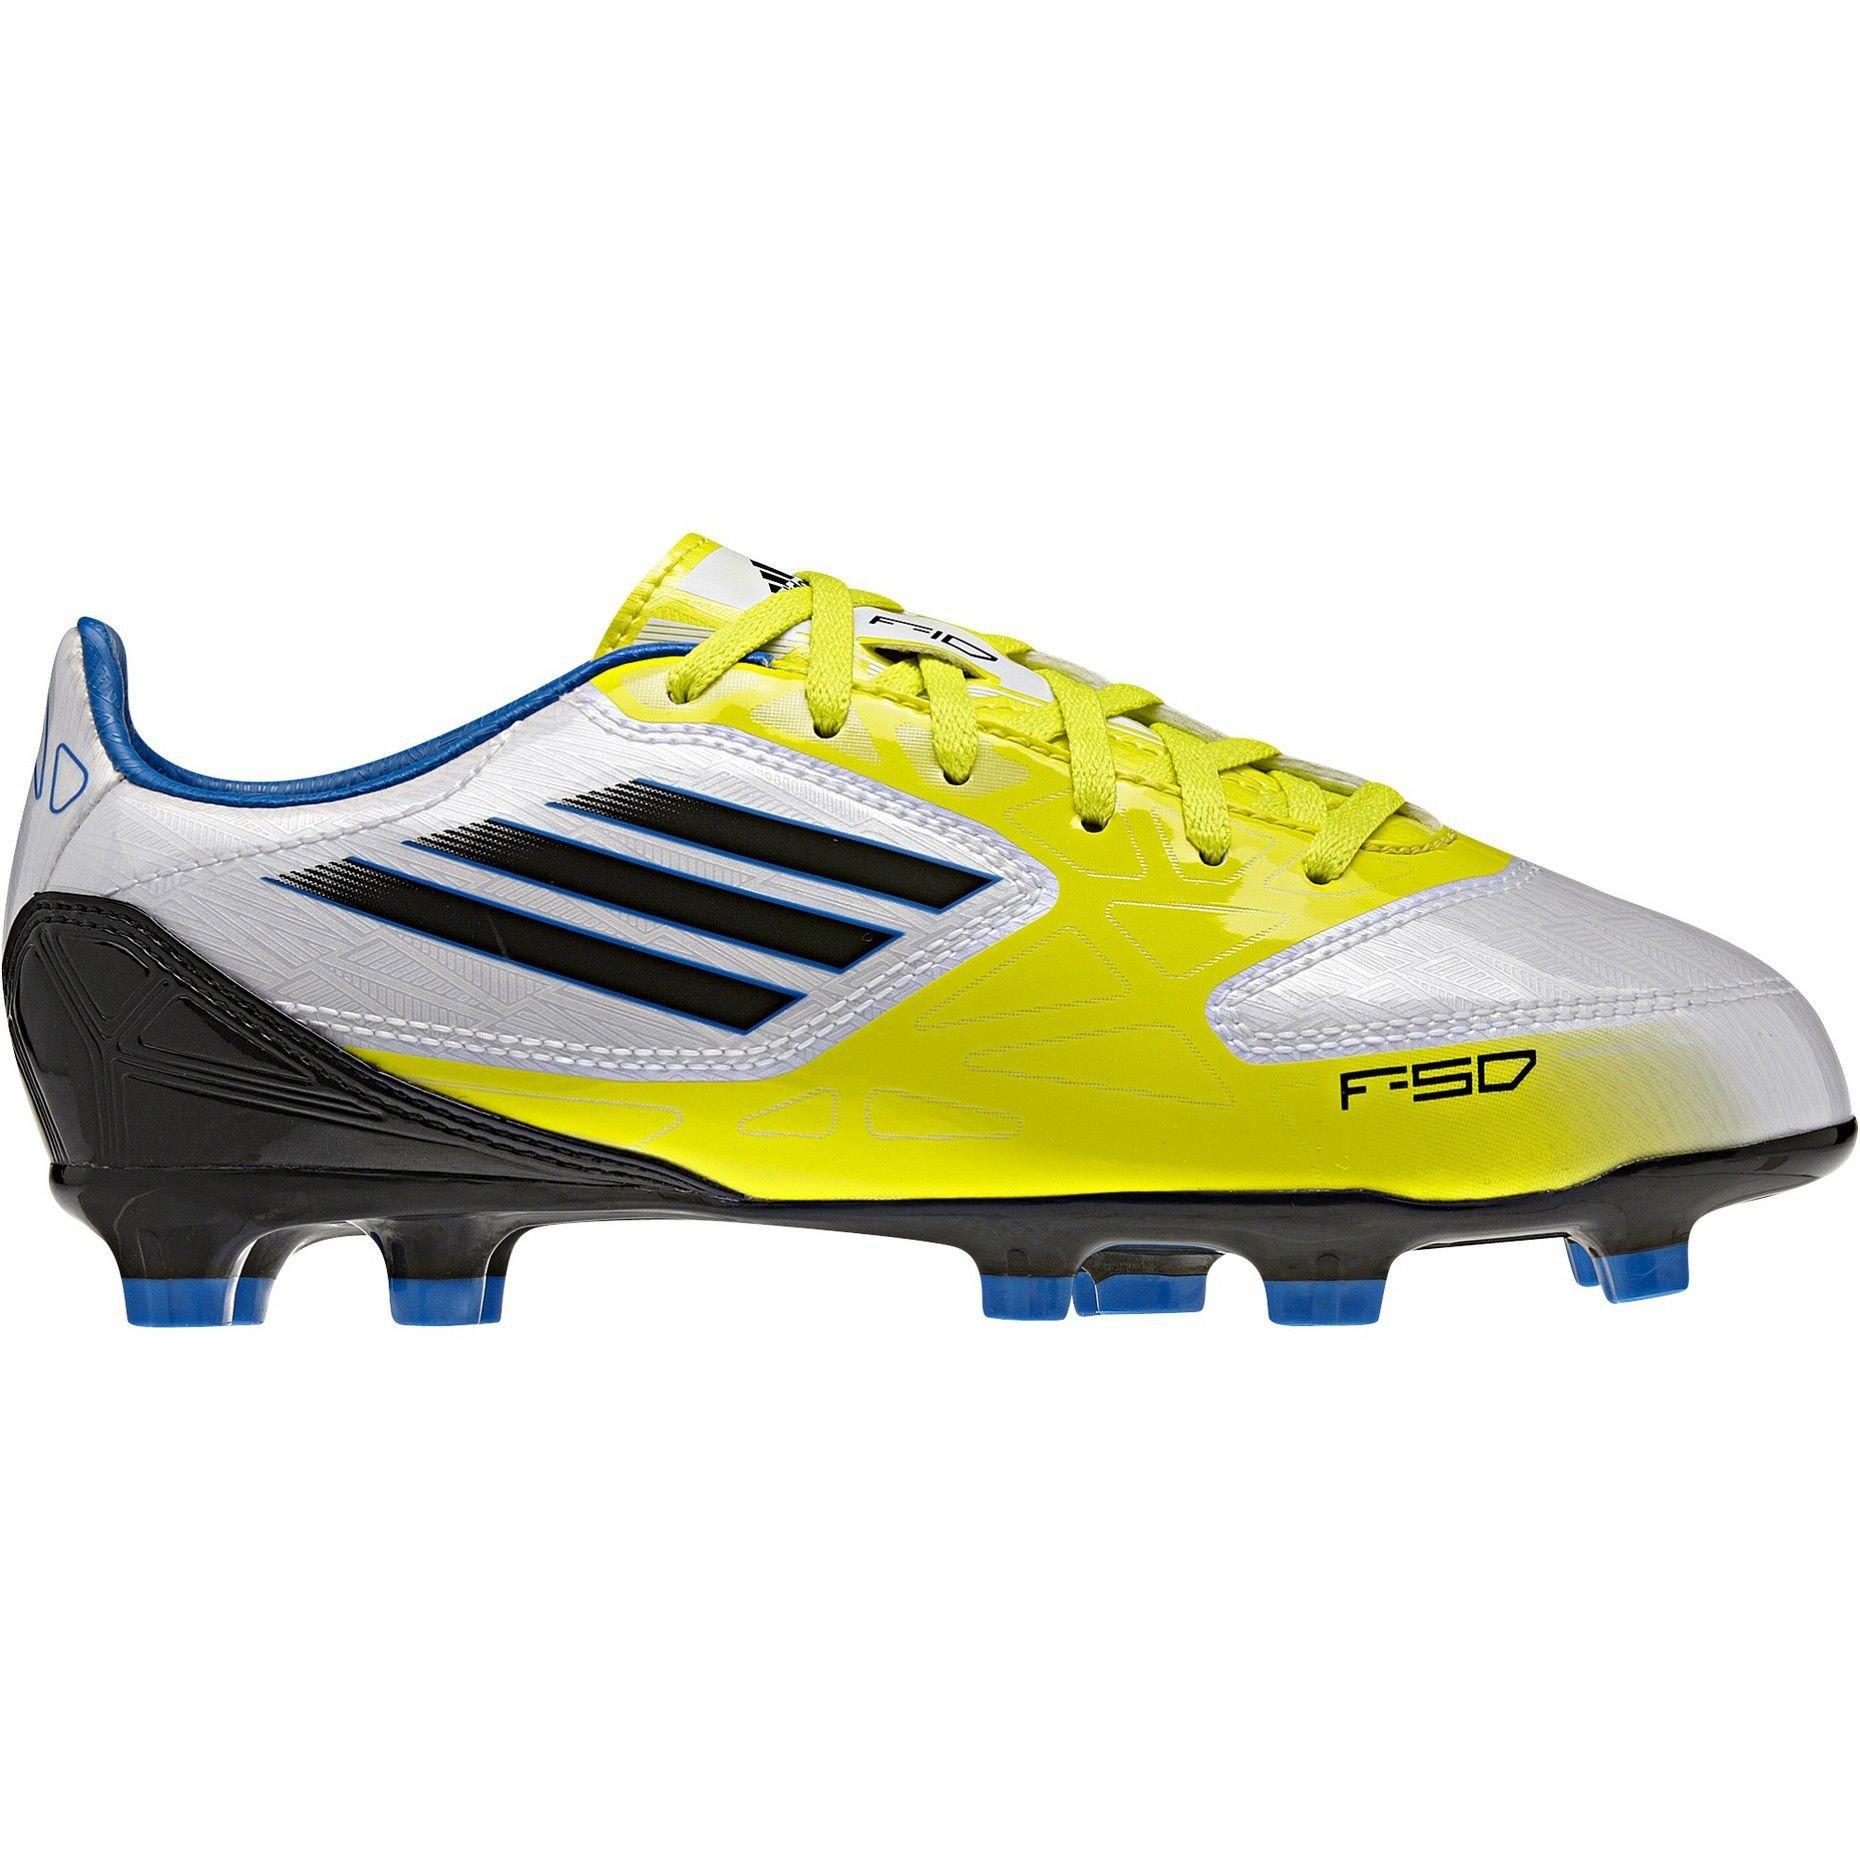 Dziecięce Korki Adidas F10 TRX FG Jr (V21315) 825  4575a0d83